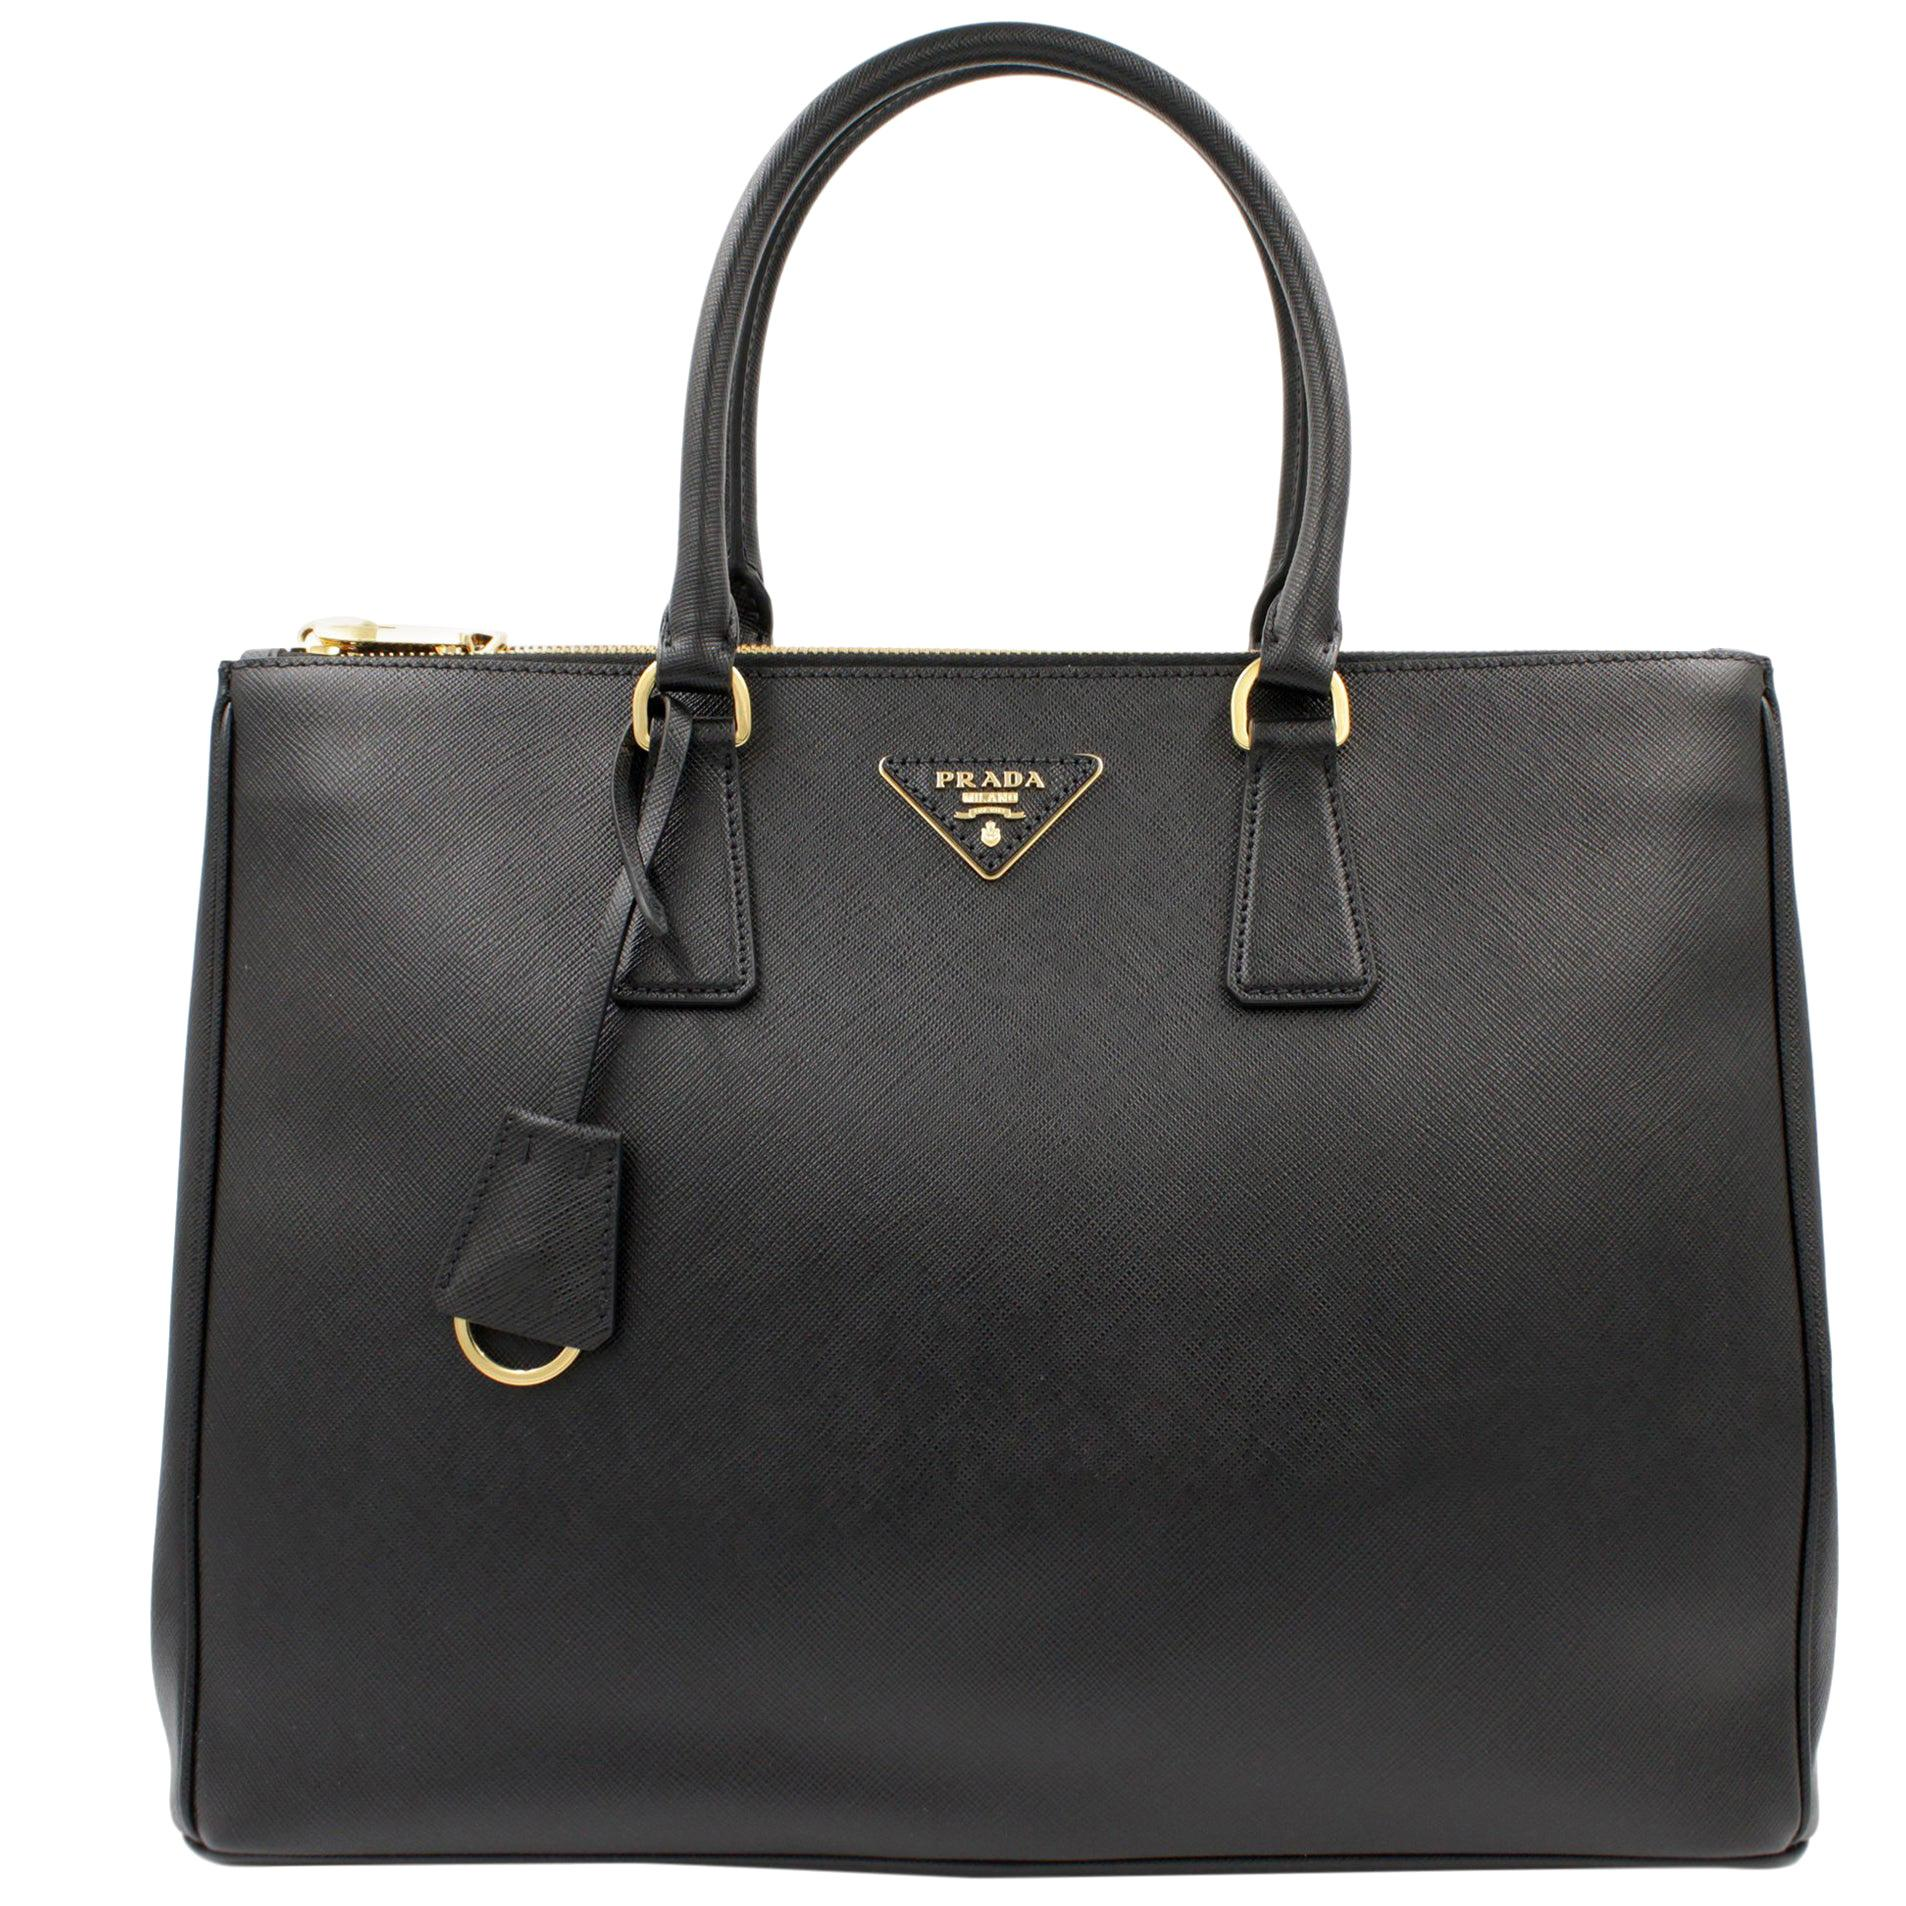 PRADA Saffiano Lux Galleria Black Leather Ladies Tote 1BA786NZV